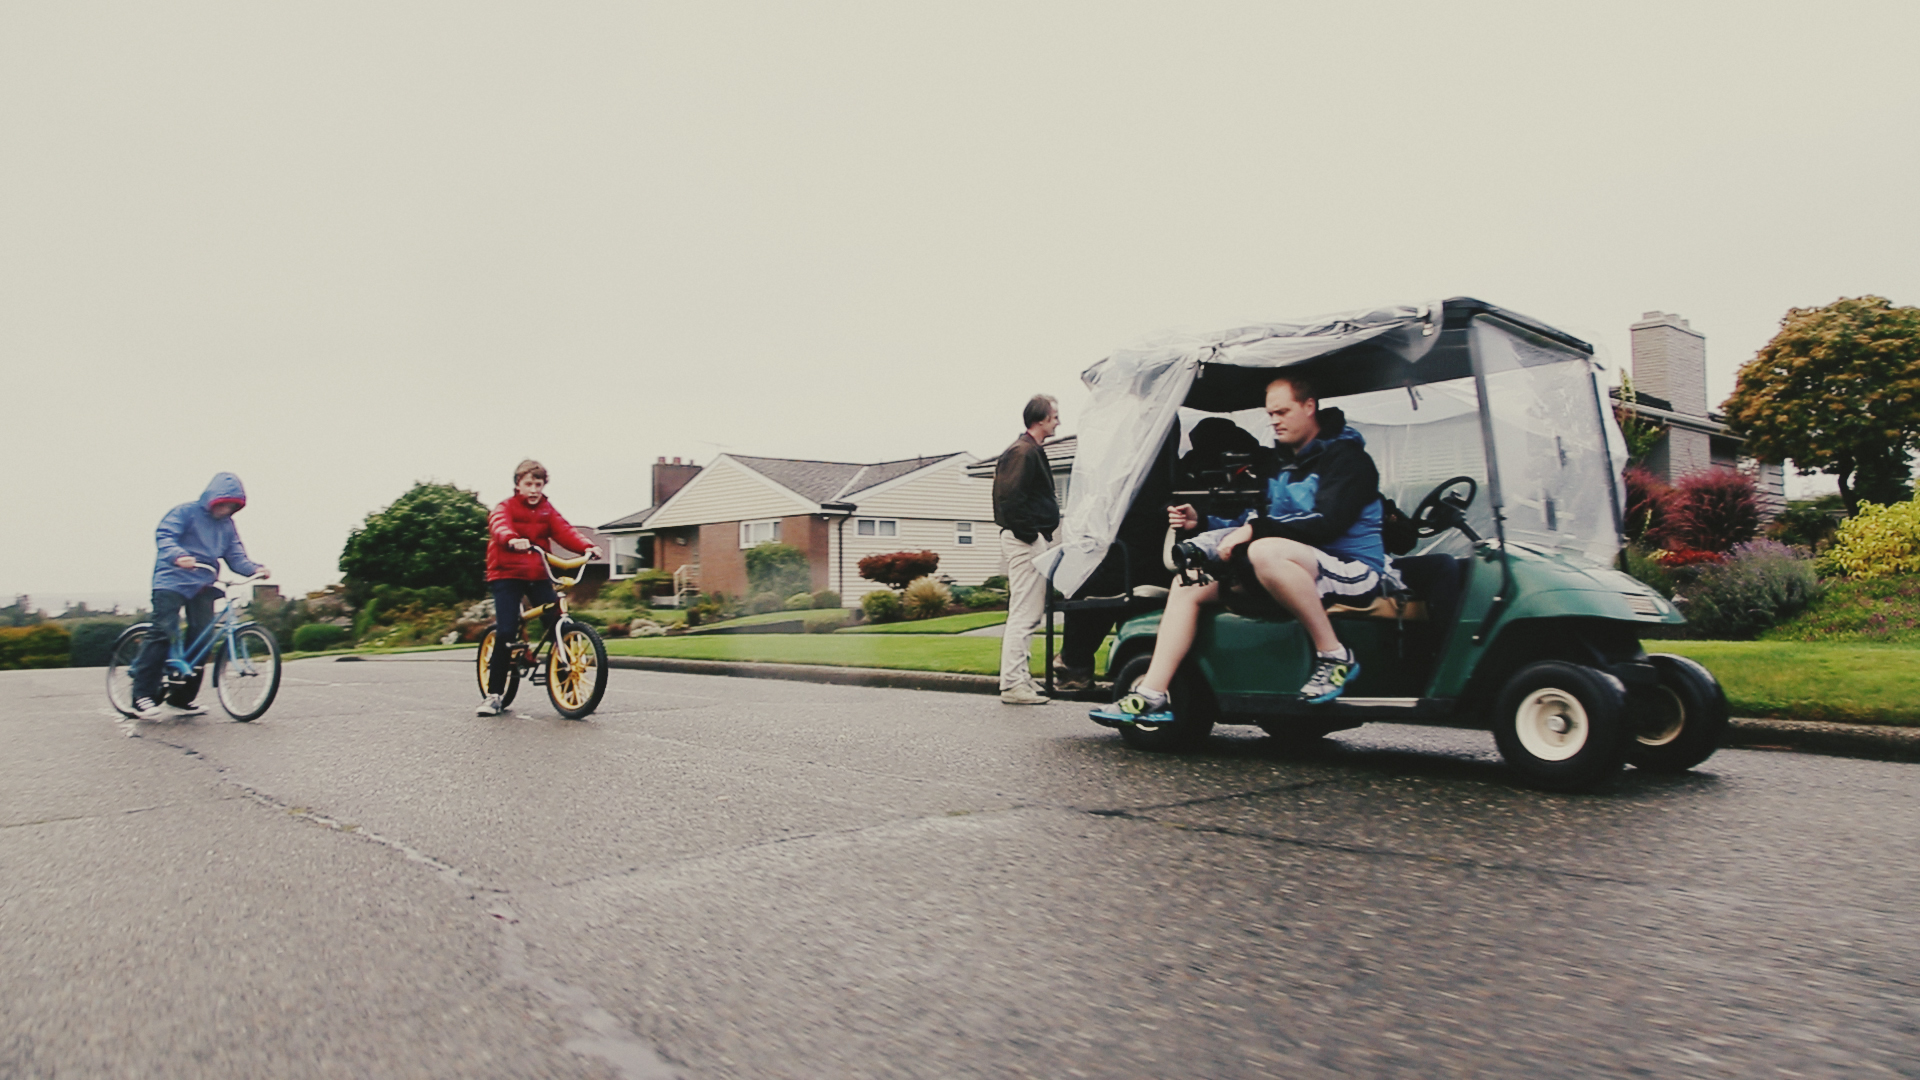 MINDCASTLE-from-1994-biking-BTS-03.jpg